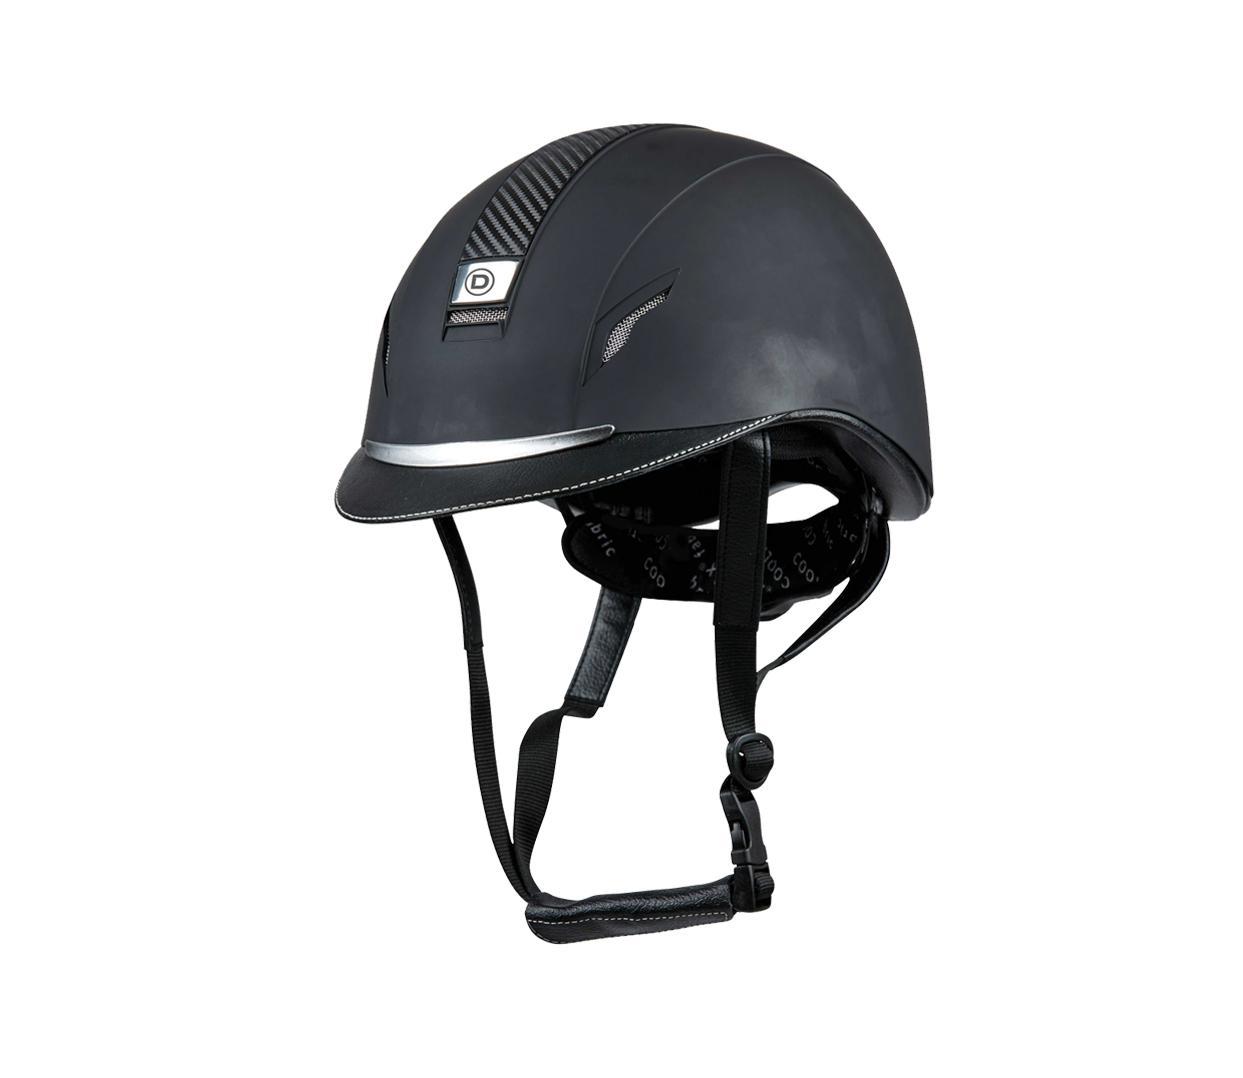 Airation Linear Pro Helmet Black